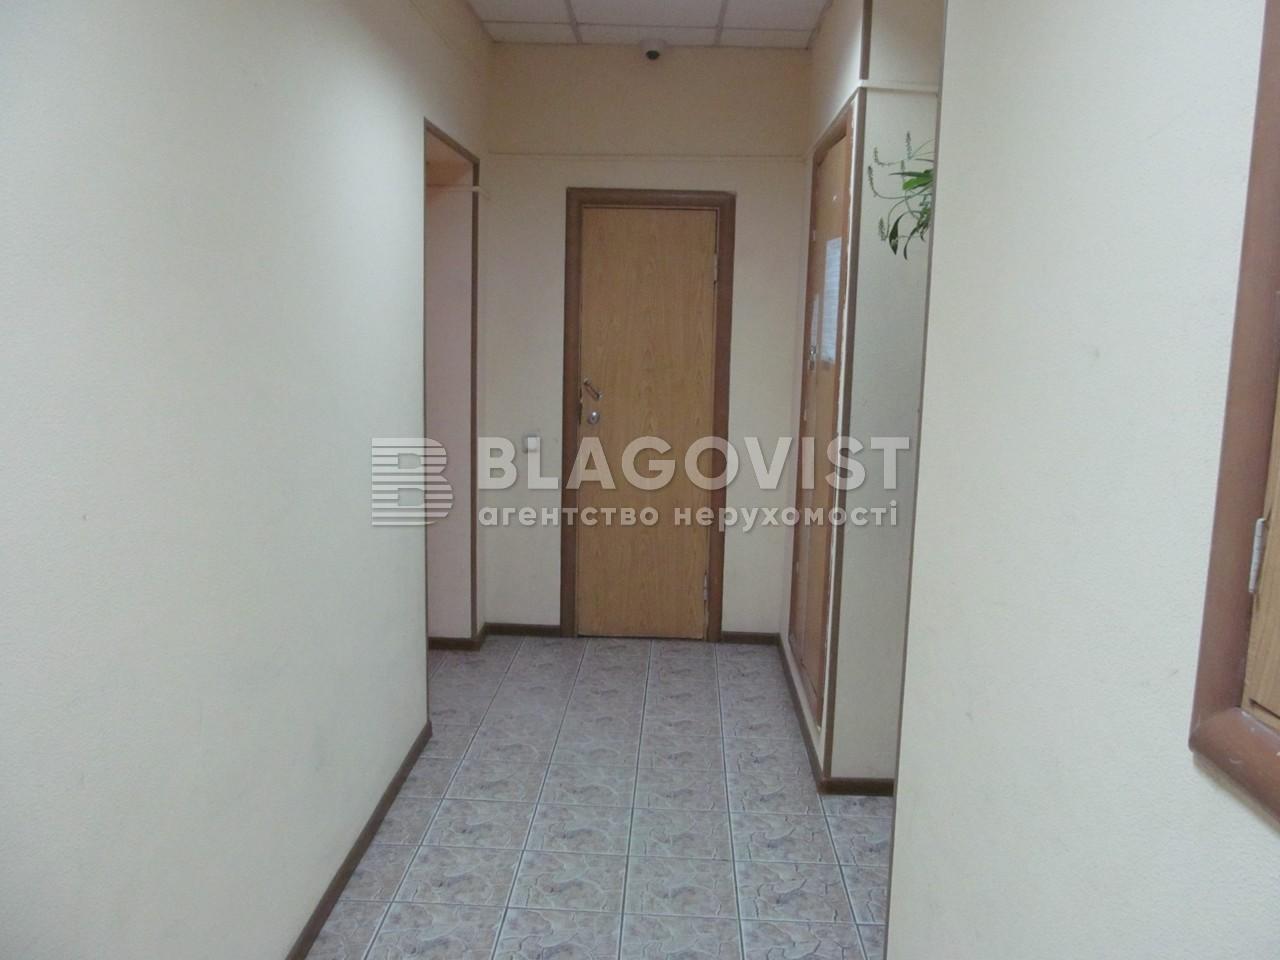 Квартира D-30452, Клиническая, 23/25, Киев - Фото 21